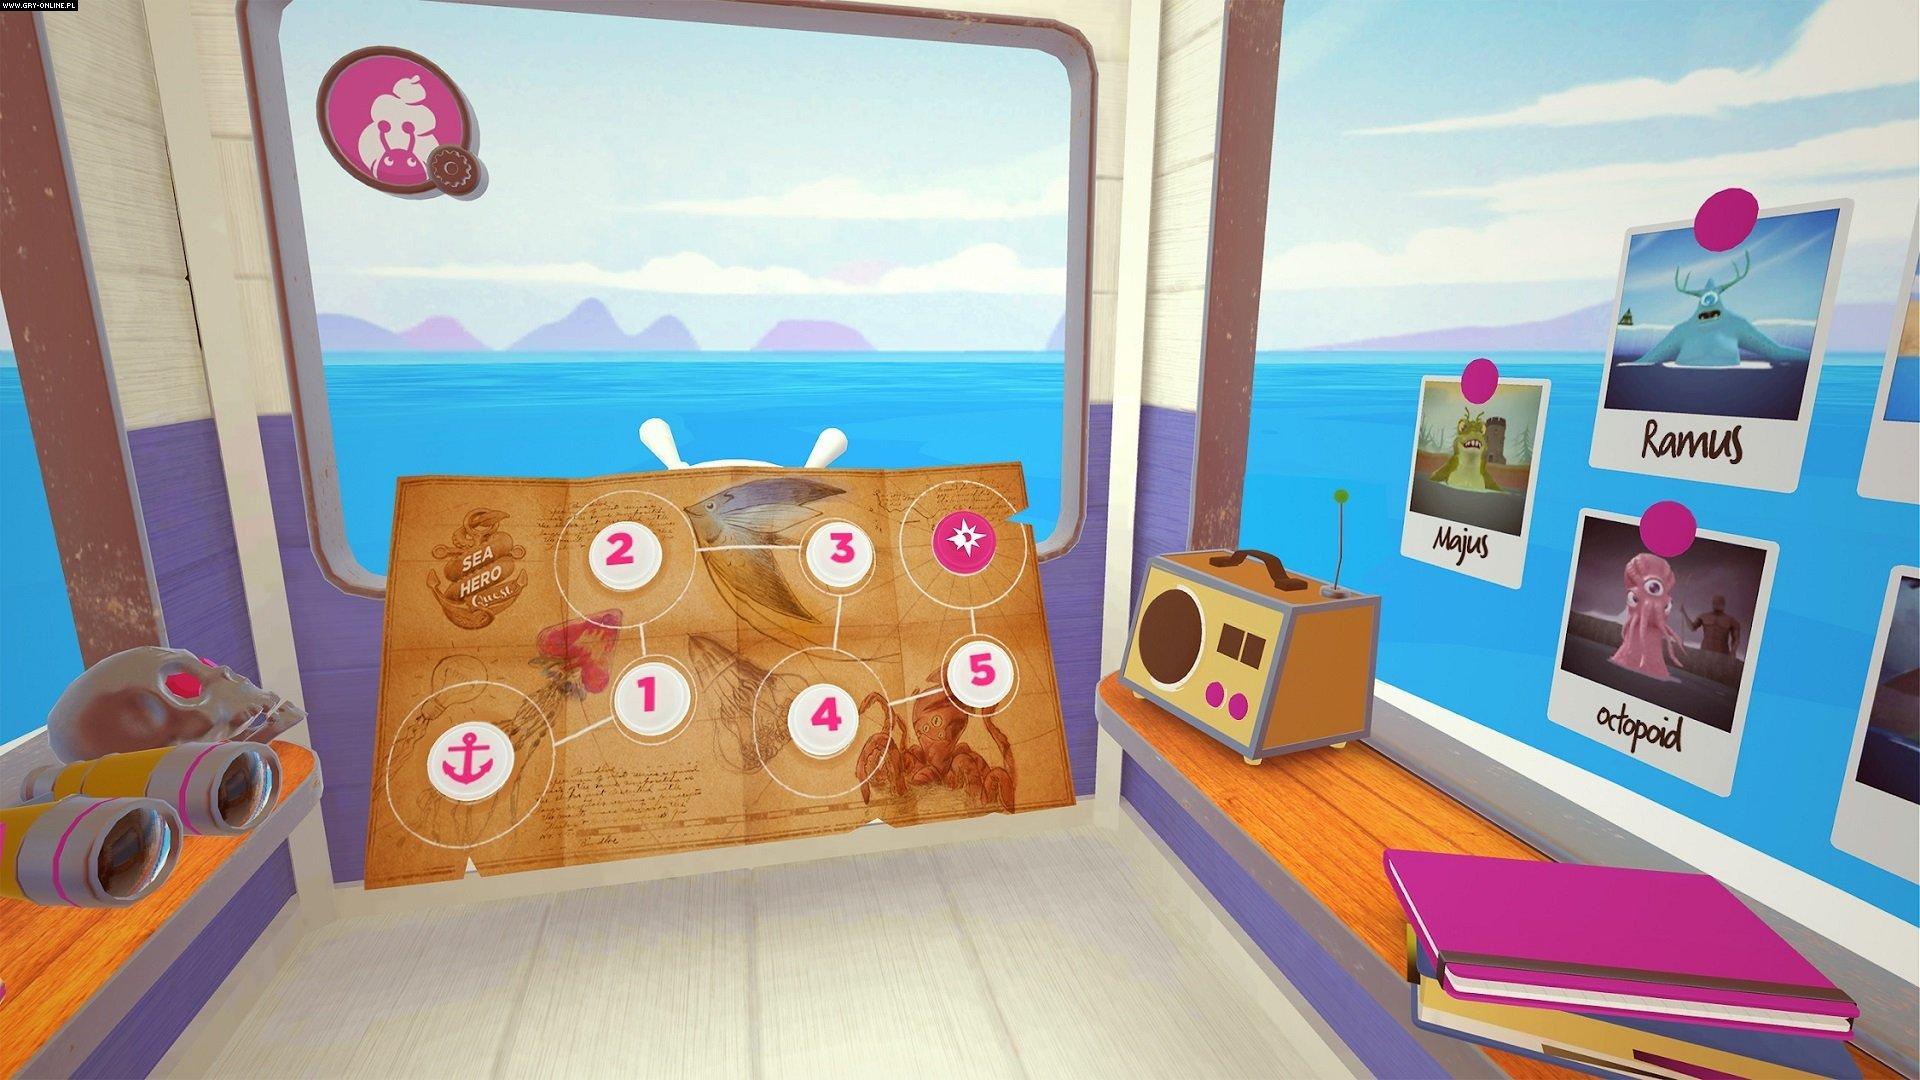 sea hero quest mobile game